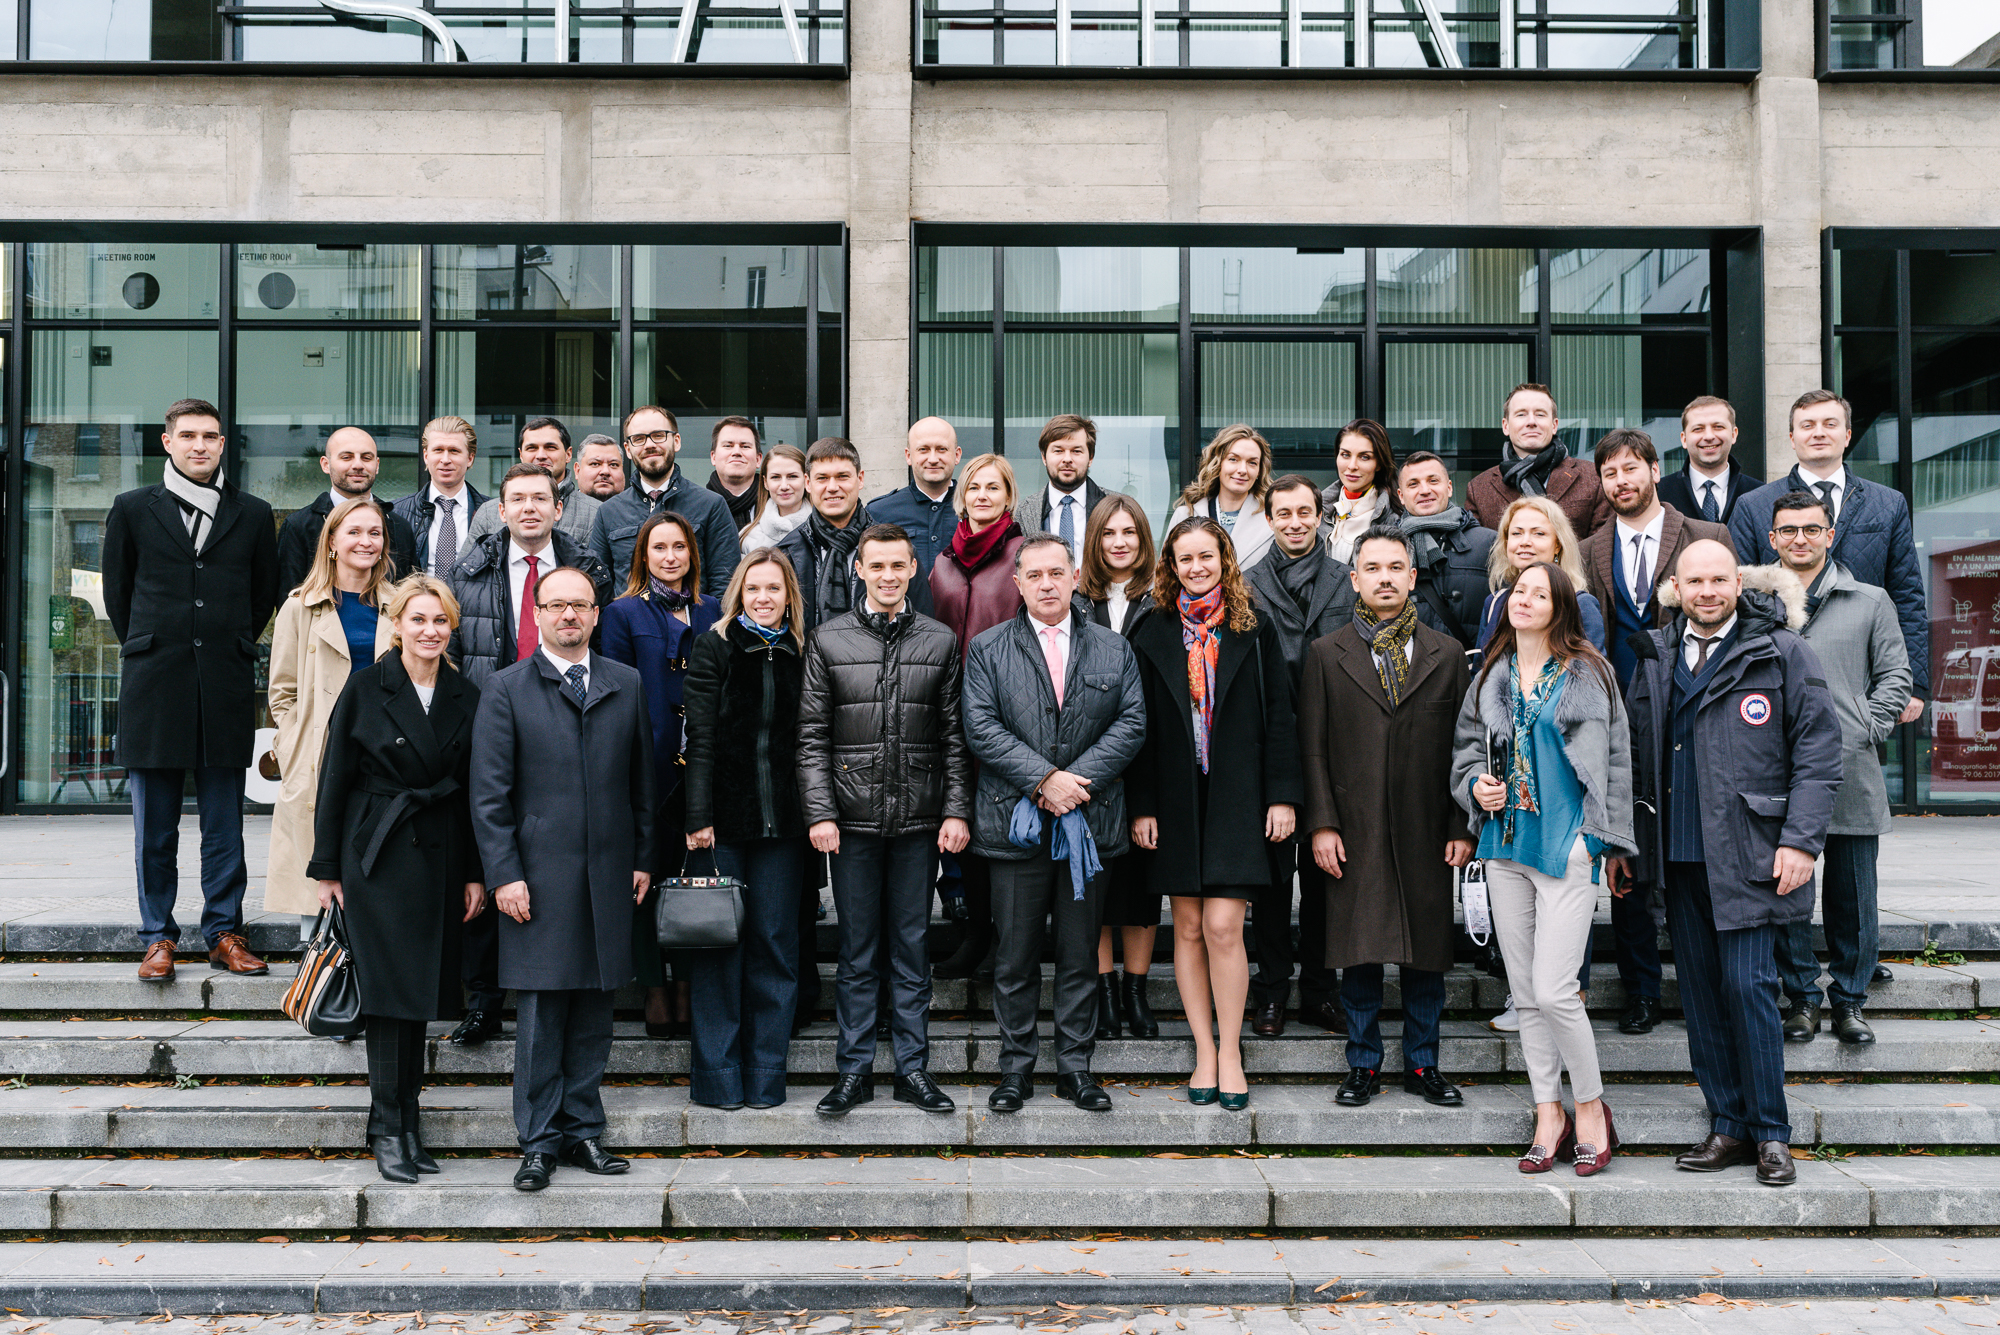 Встреча «Choiseul Франция-Россия» в Париже – Посещение стартап-кампуса «Station F»